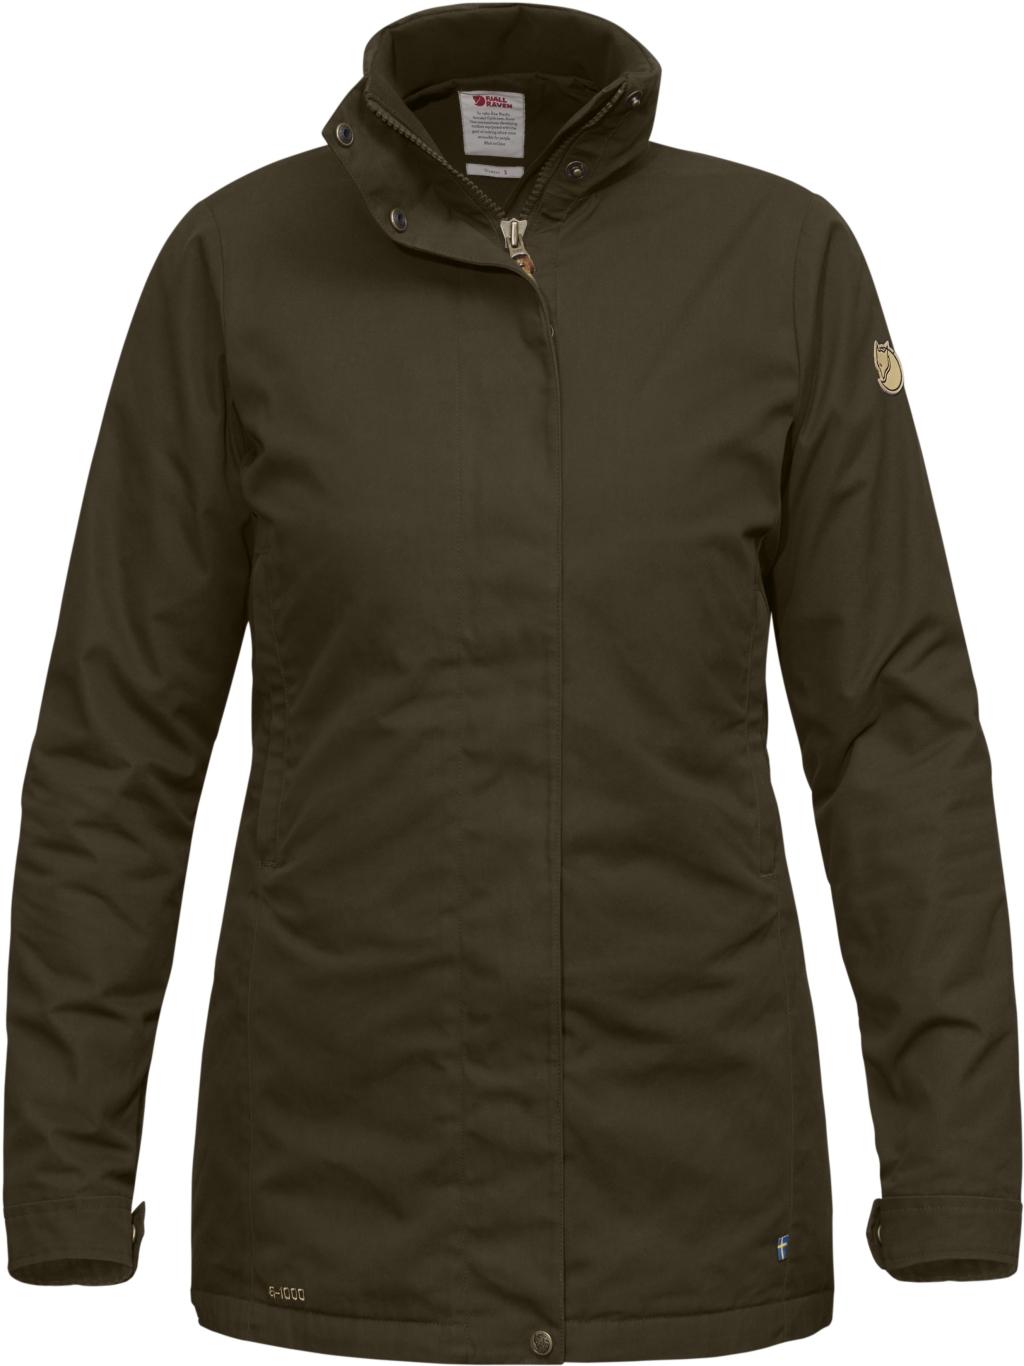 FjallRaven Sormland Padded Jacket W Dark Olive-30